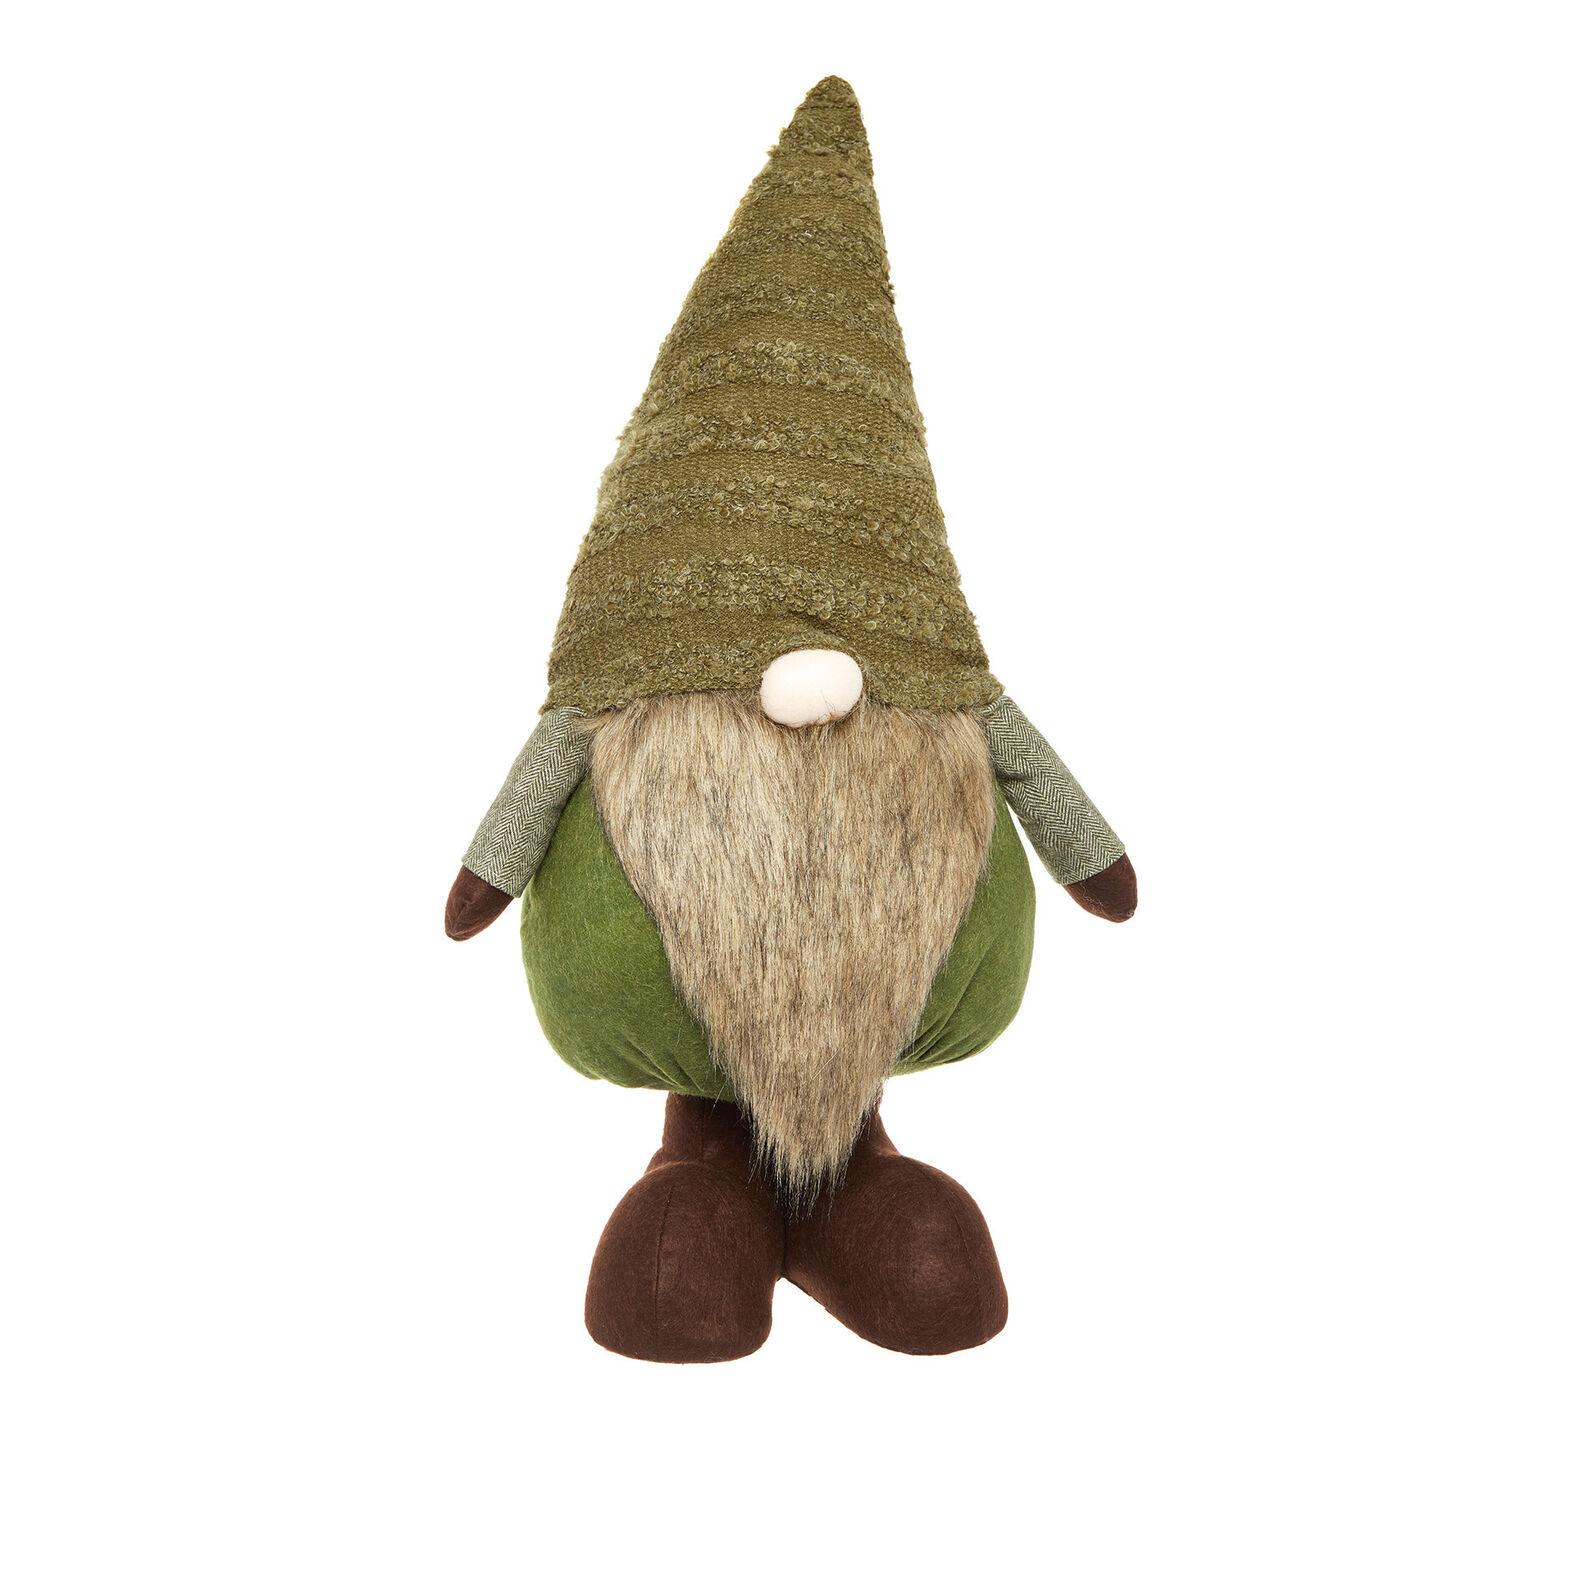 Decorative gnome soft toy H 78 cm